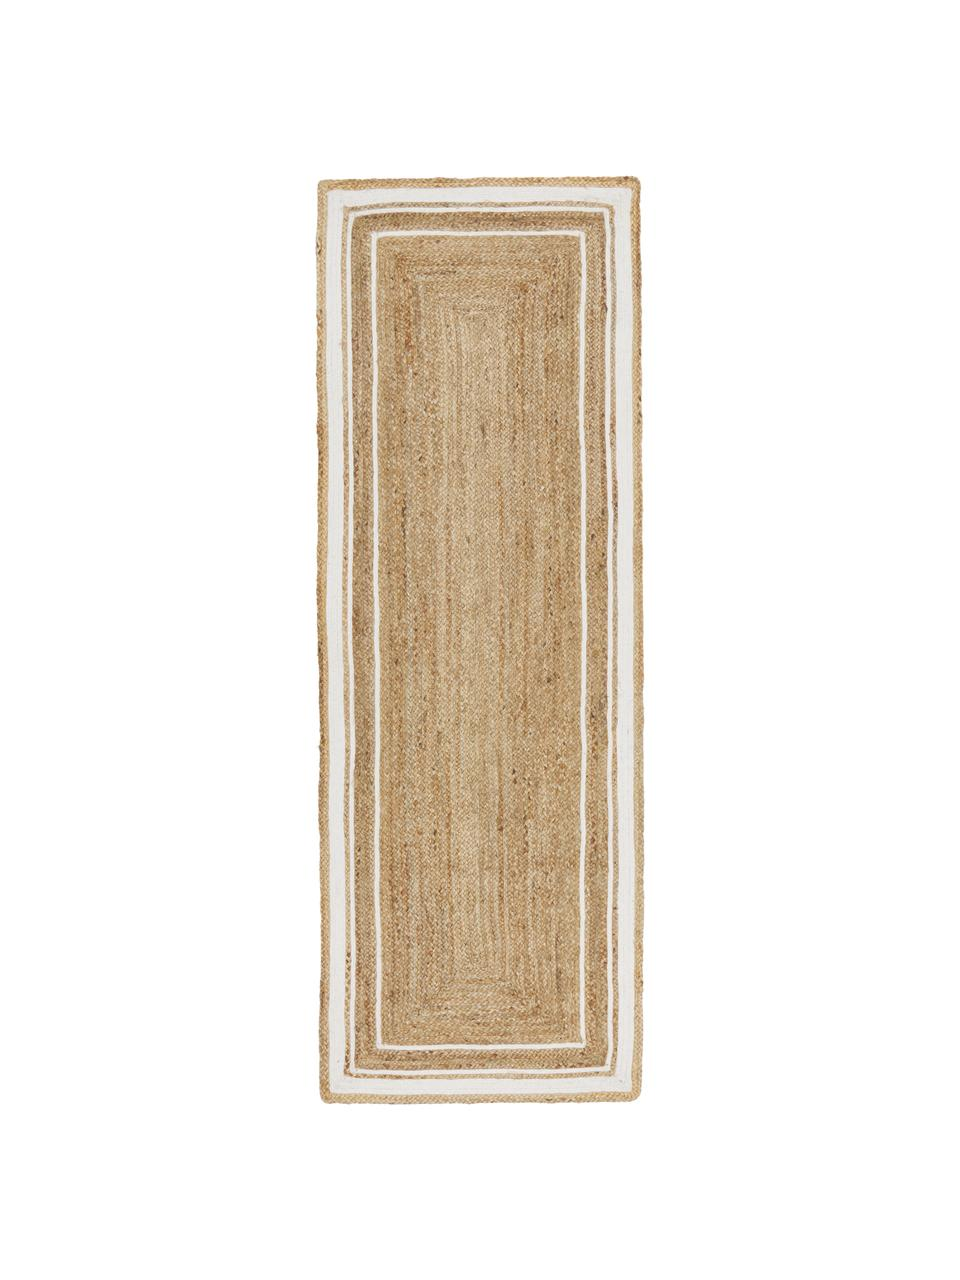 Handgewebter Jute-Läufer Clover, 100% Jute, Beige, Weiß, 80 x 250 cm